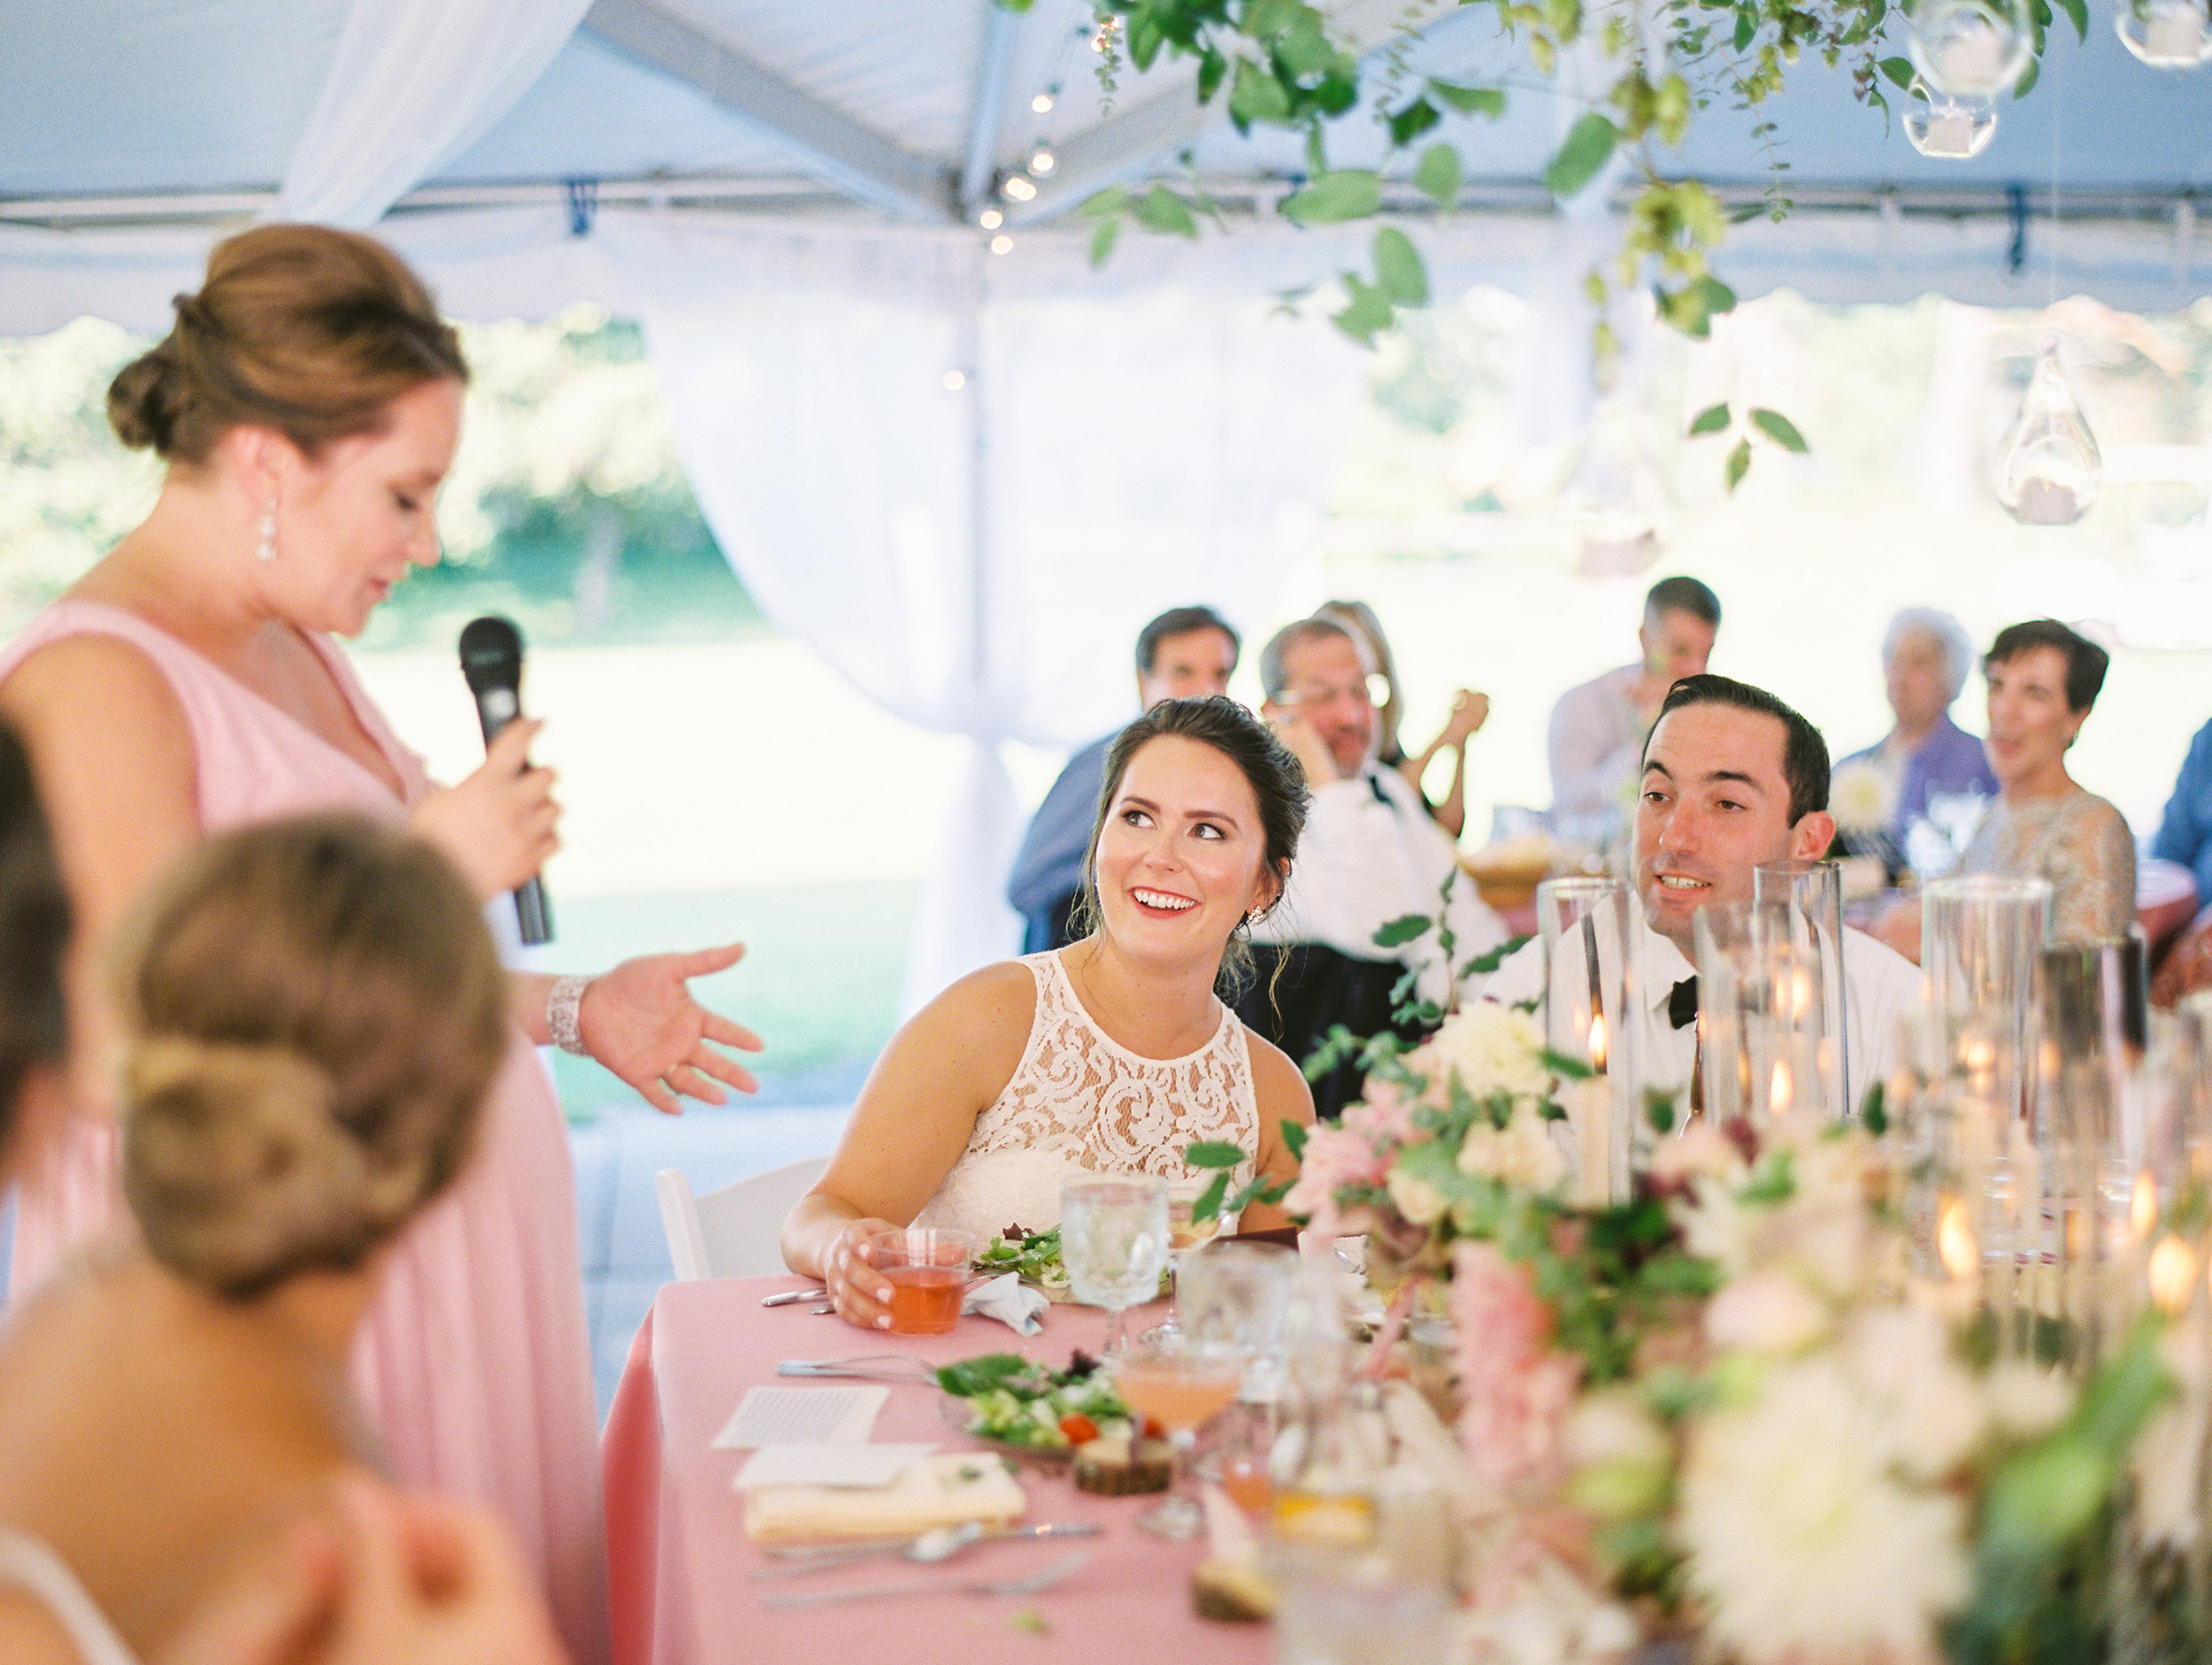 Zoller+Wedding+Reception+Toasts-95.jpg